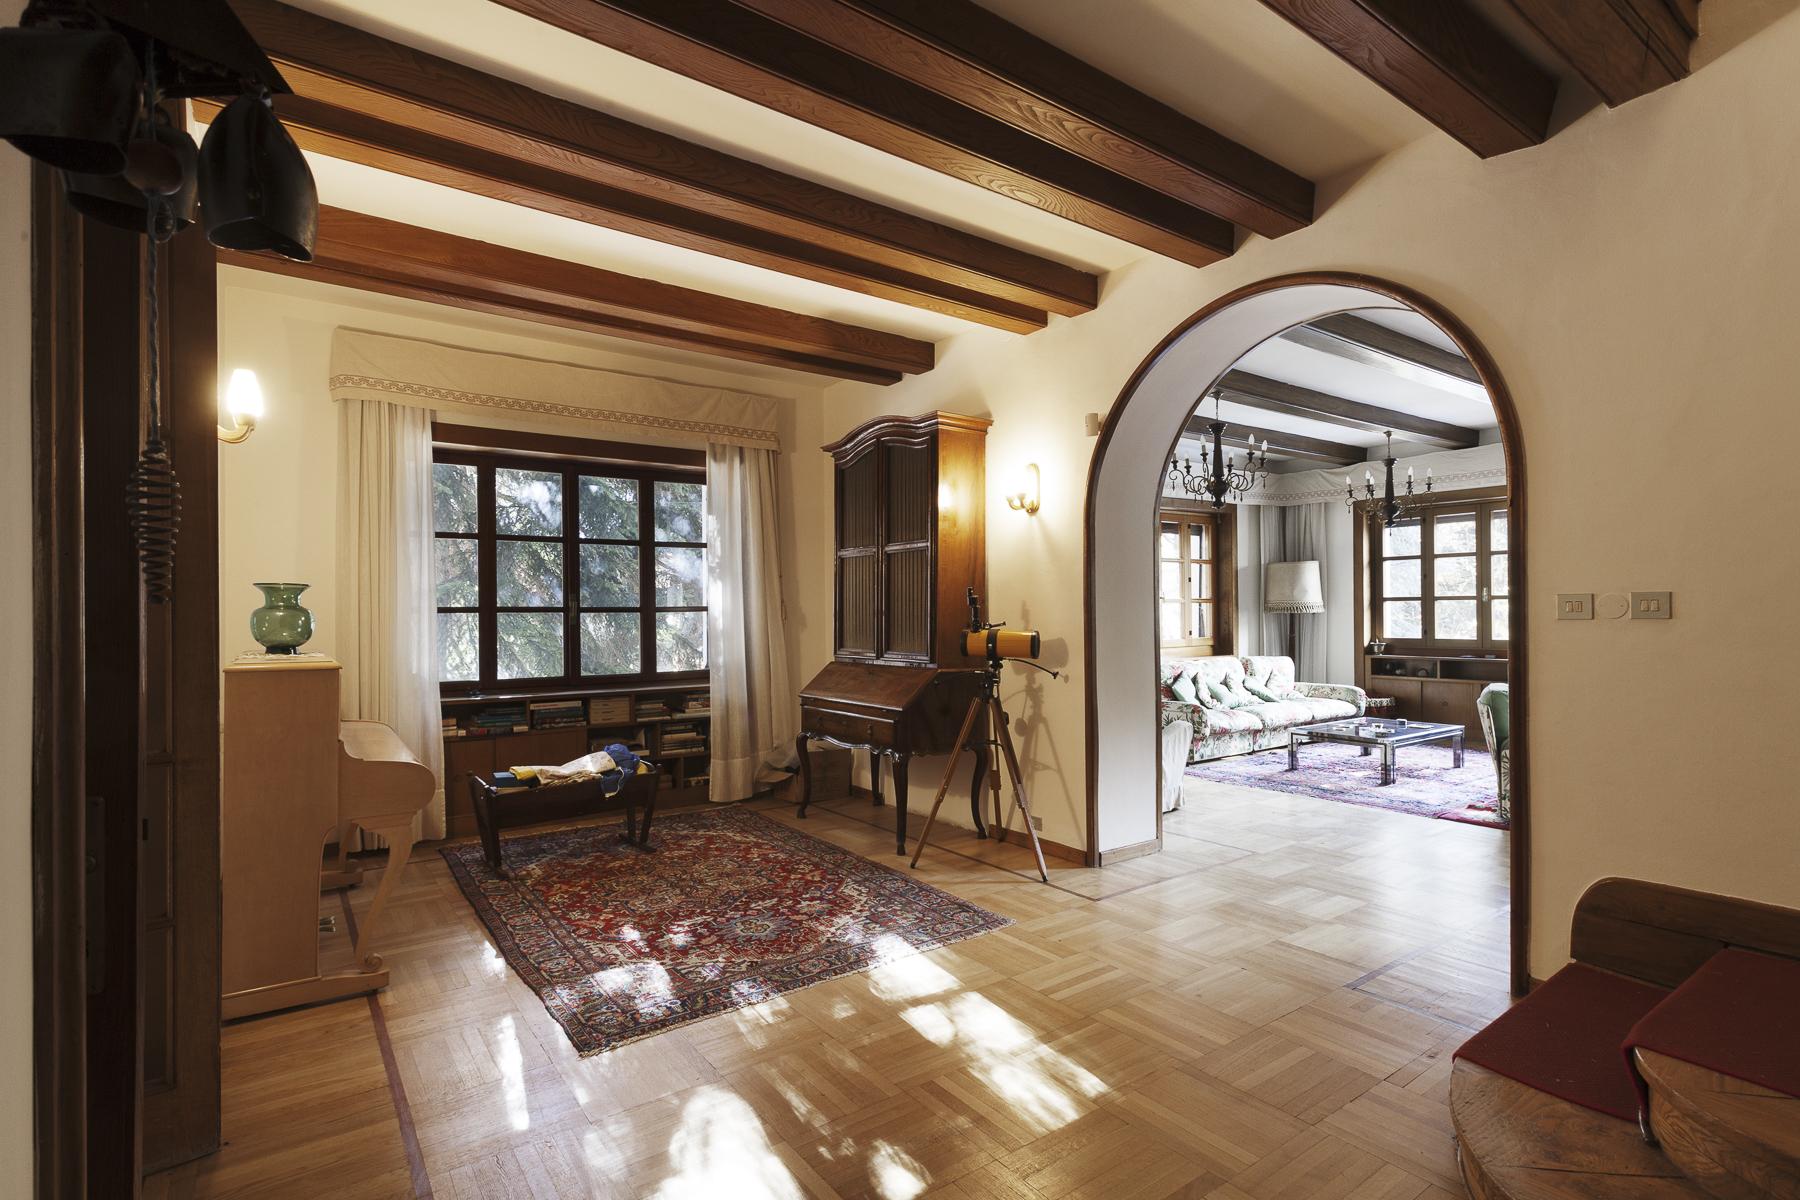 Villa in Vendita a Courmayeur: 5 locali, 1230 mq - Foto 3